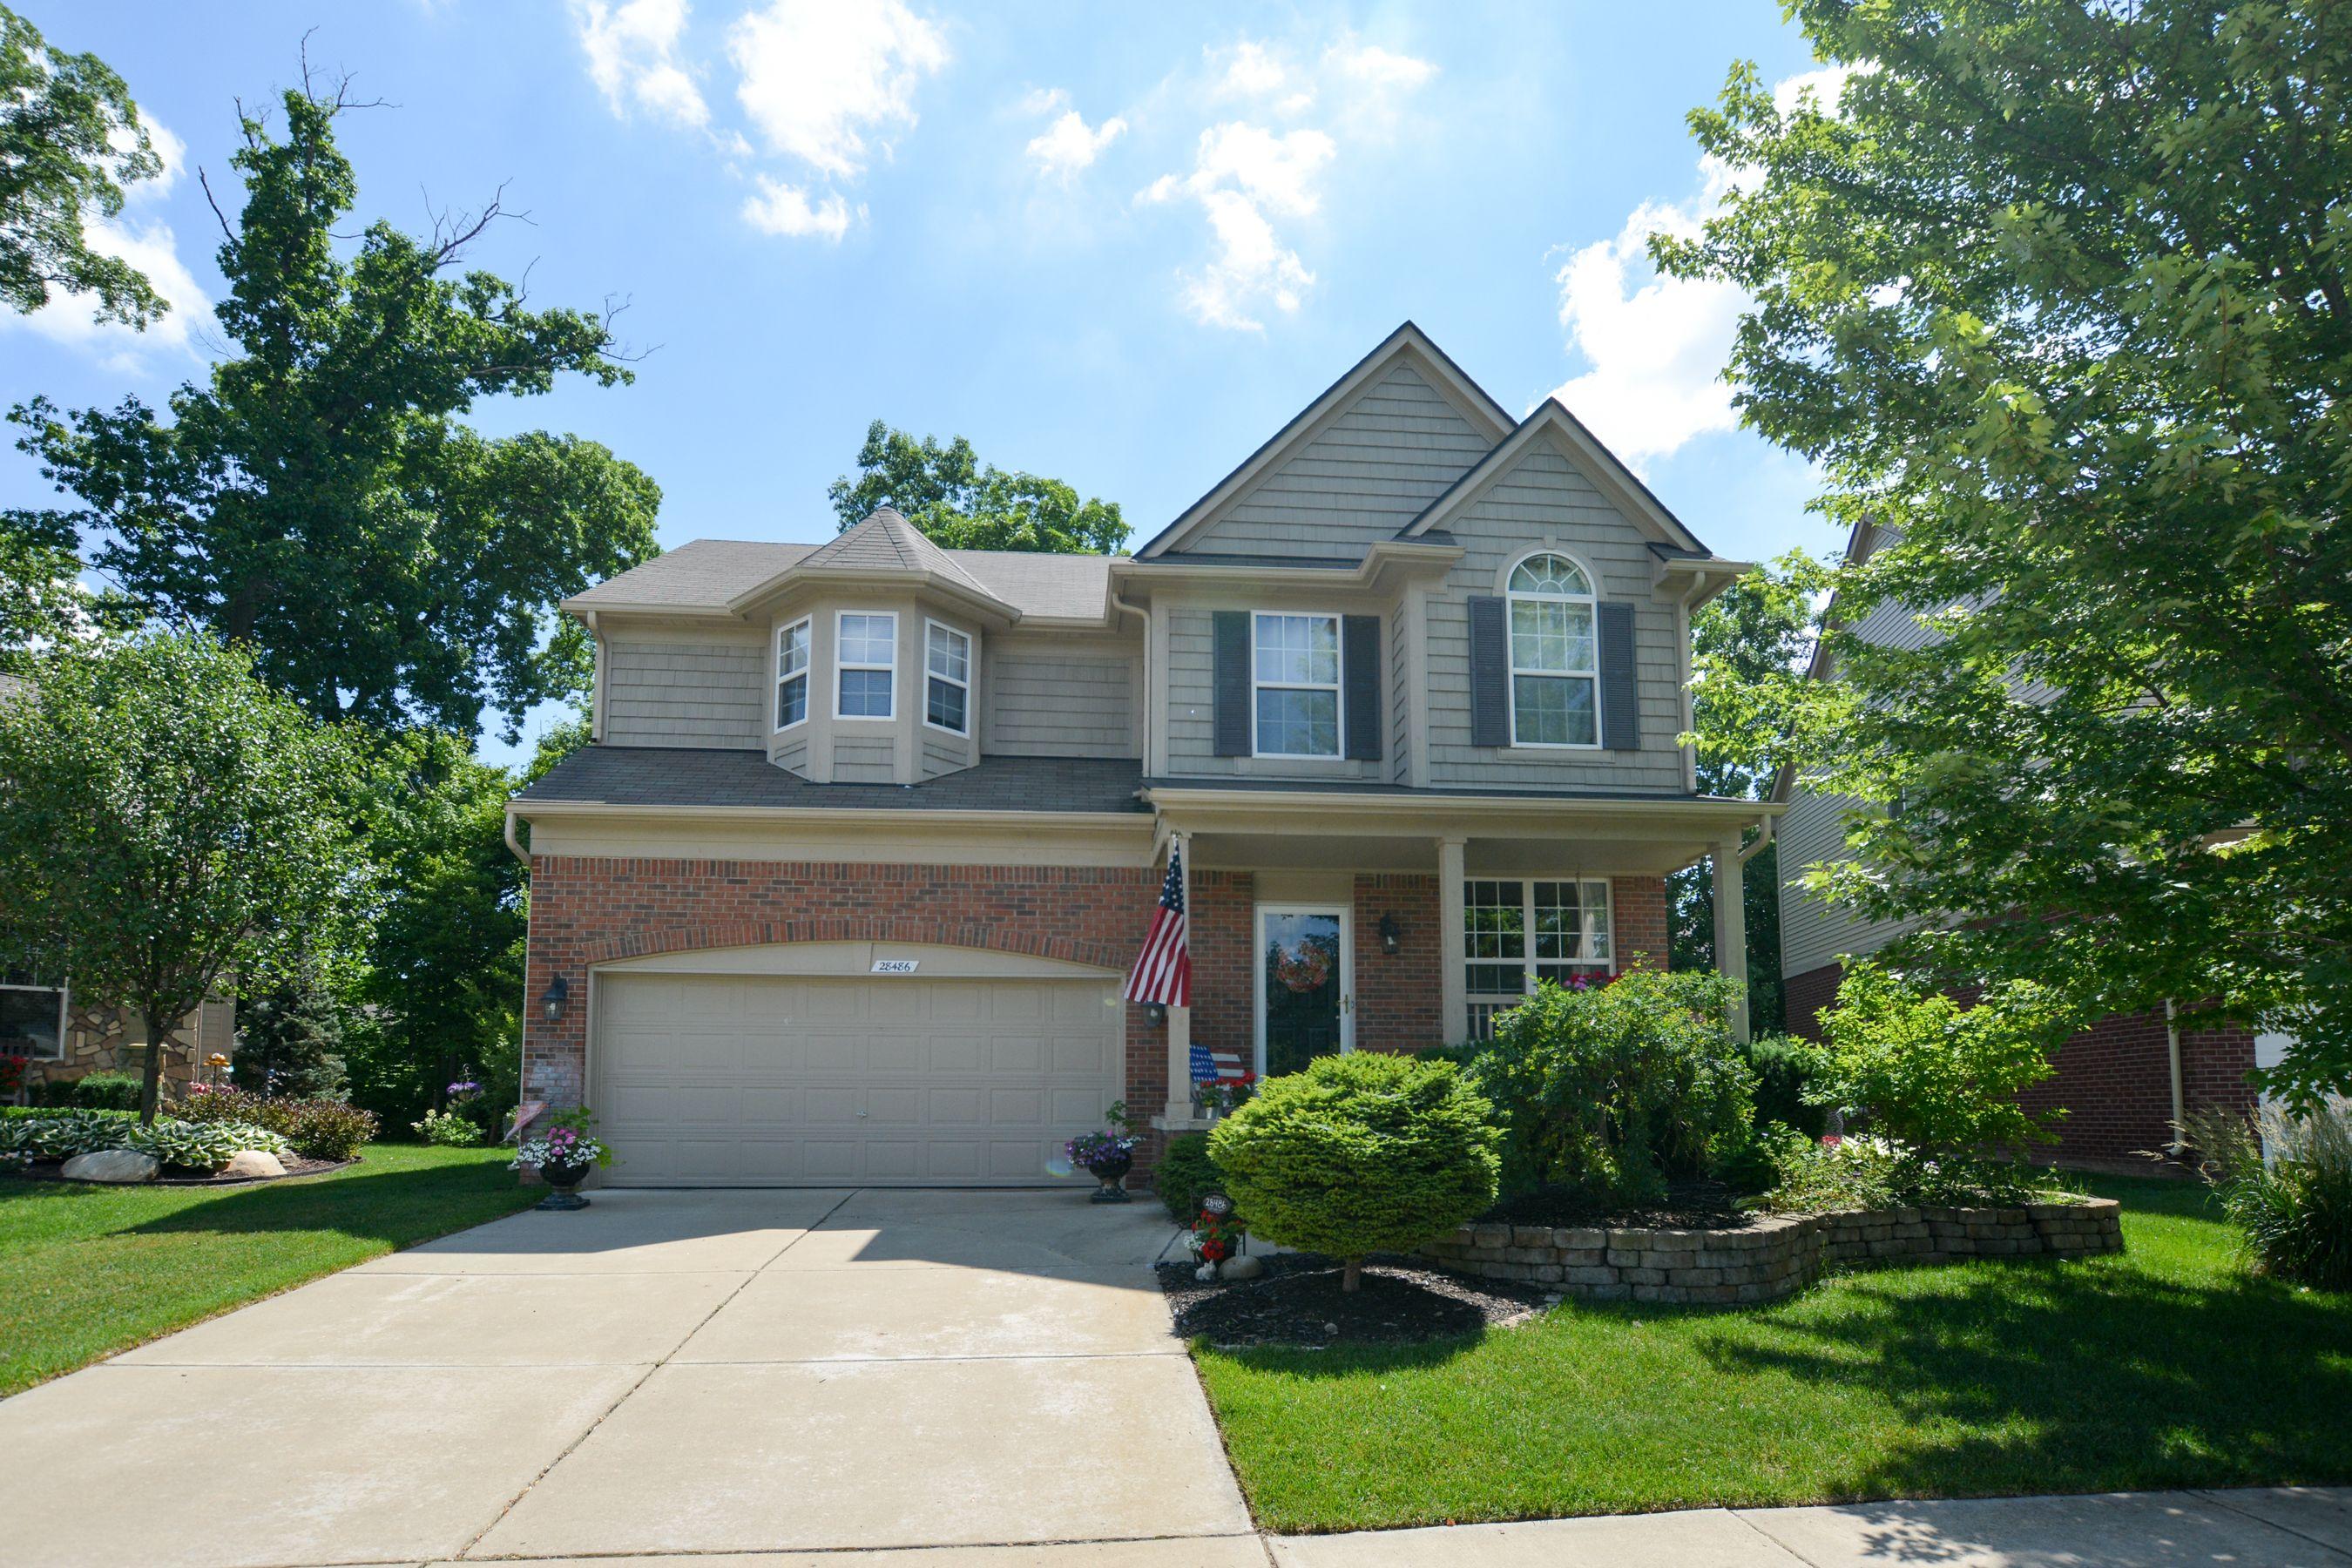 Sold 24486 cottage lane lyon township in 2020 cottage